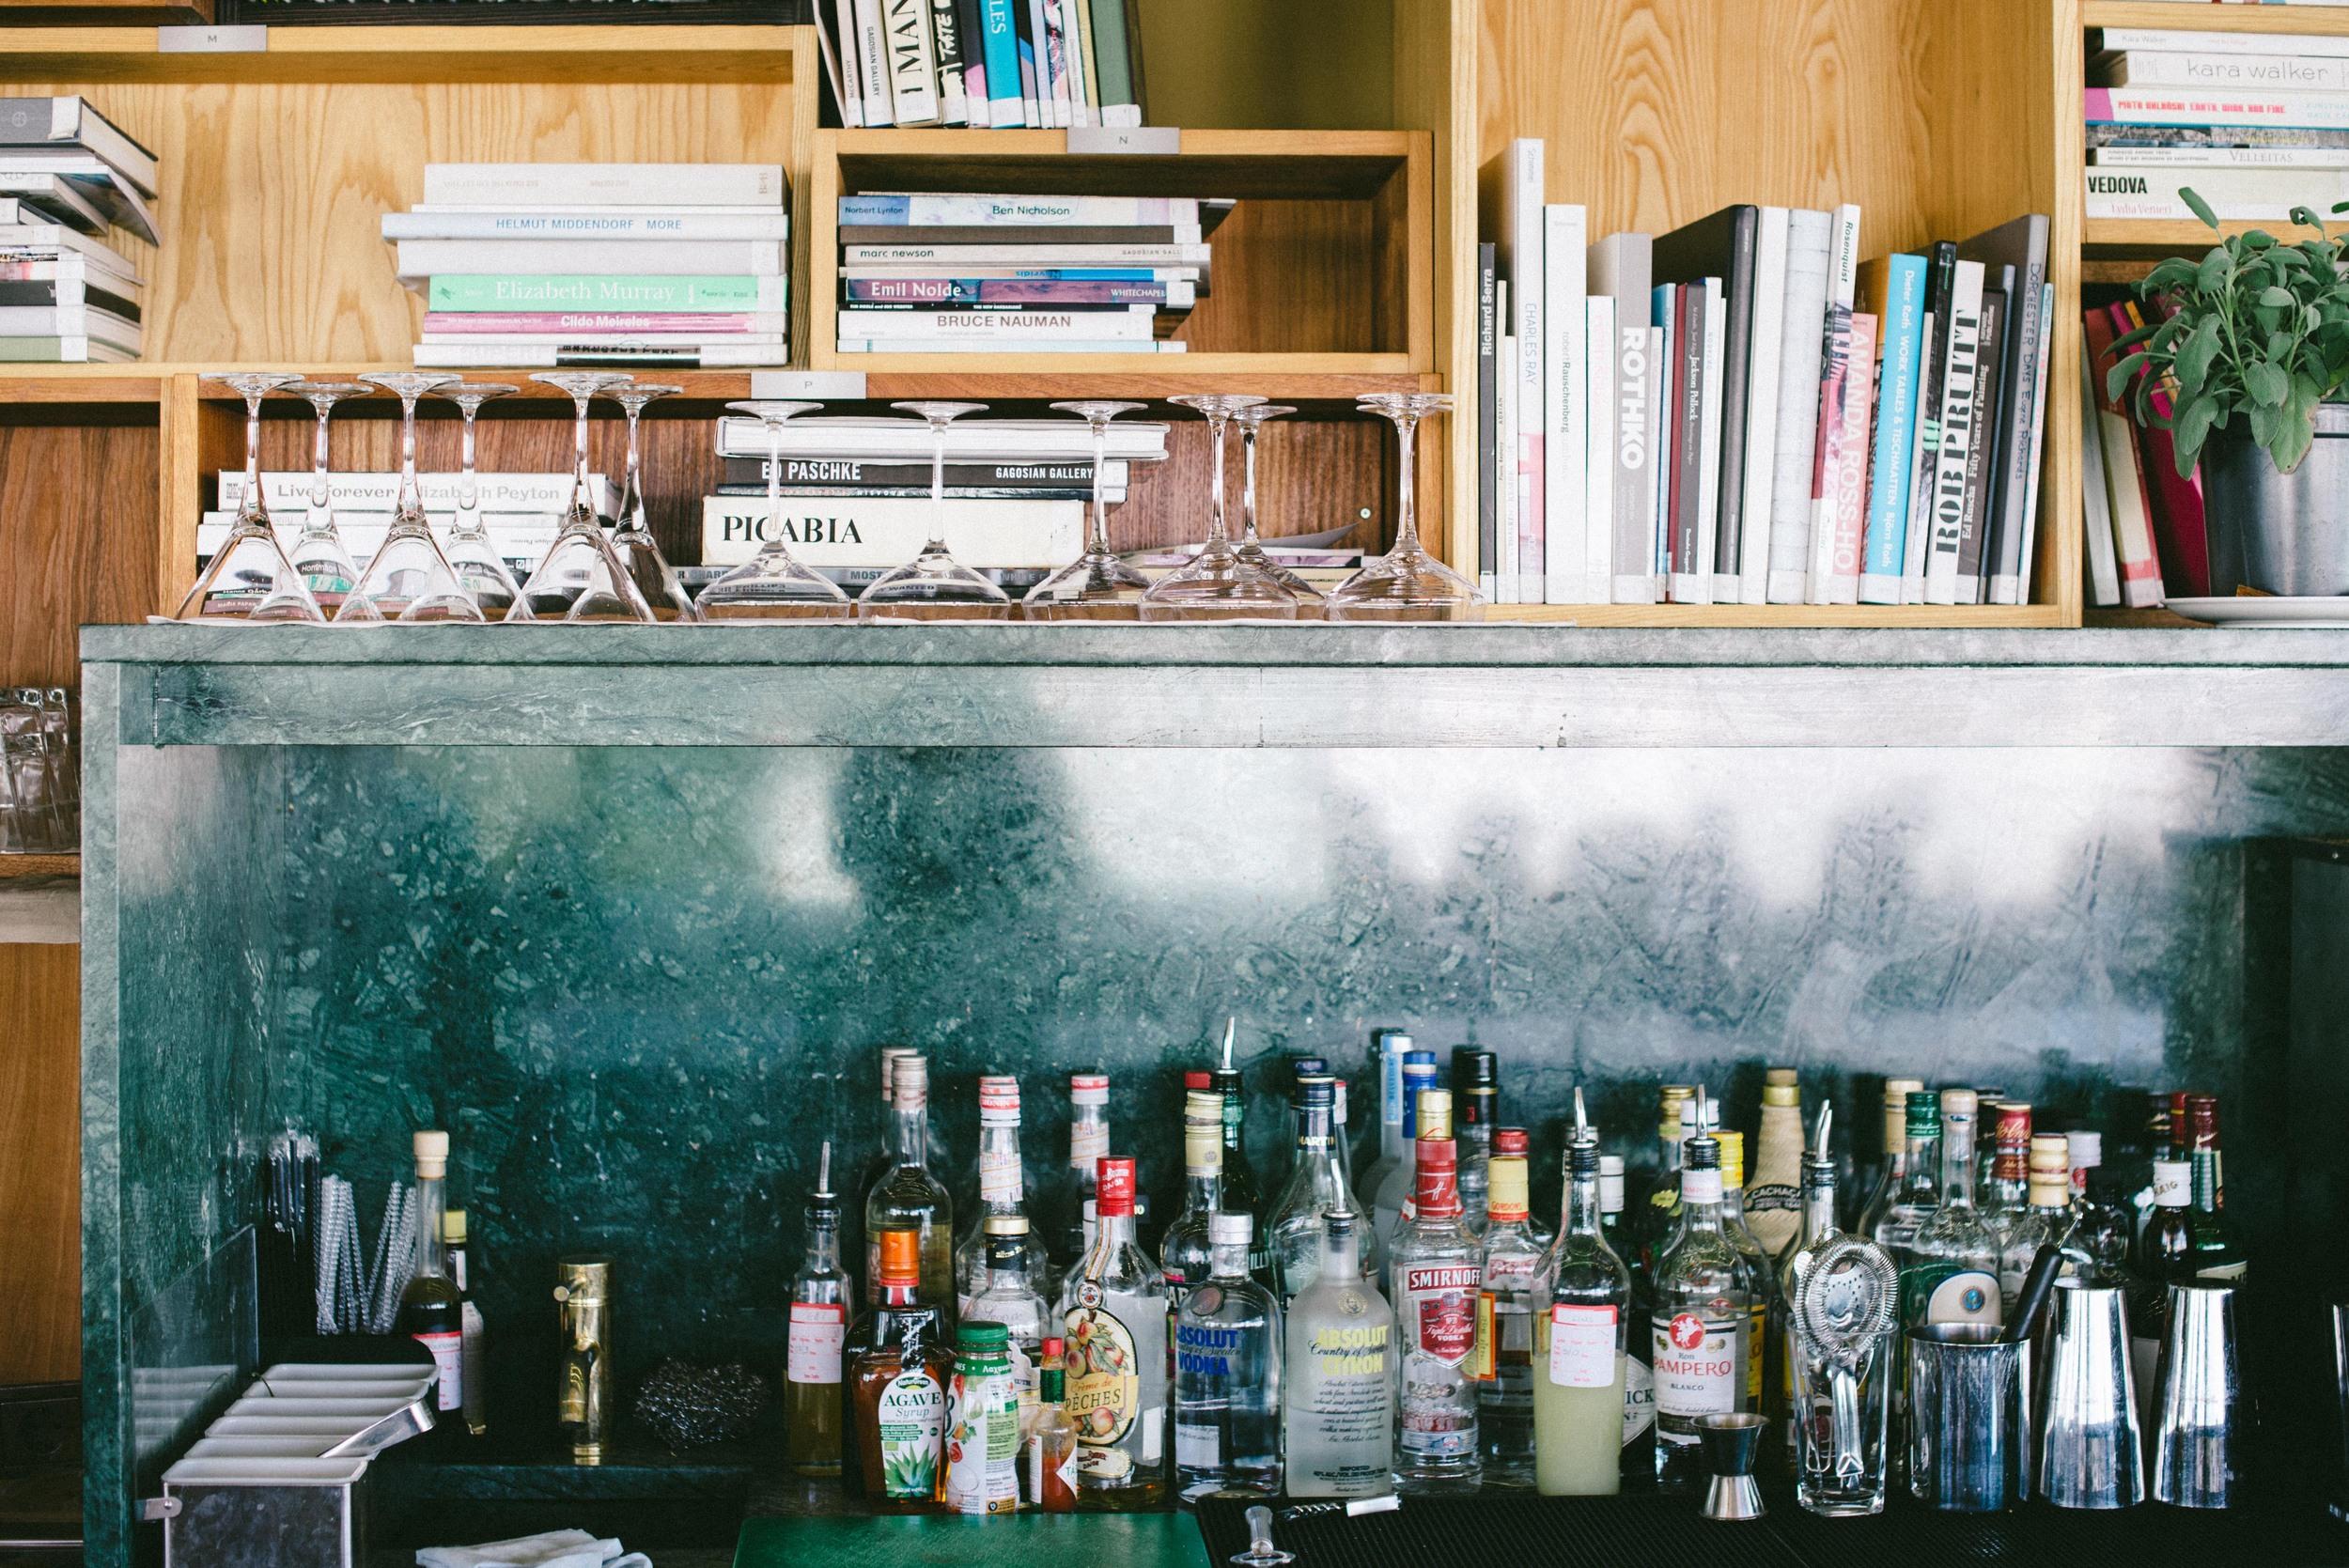 Part of the Art Lounge bar